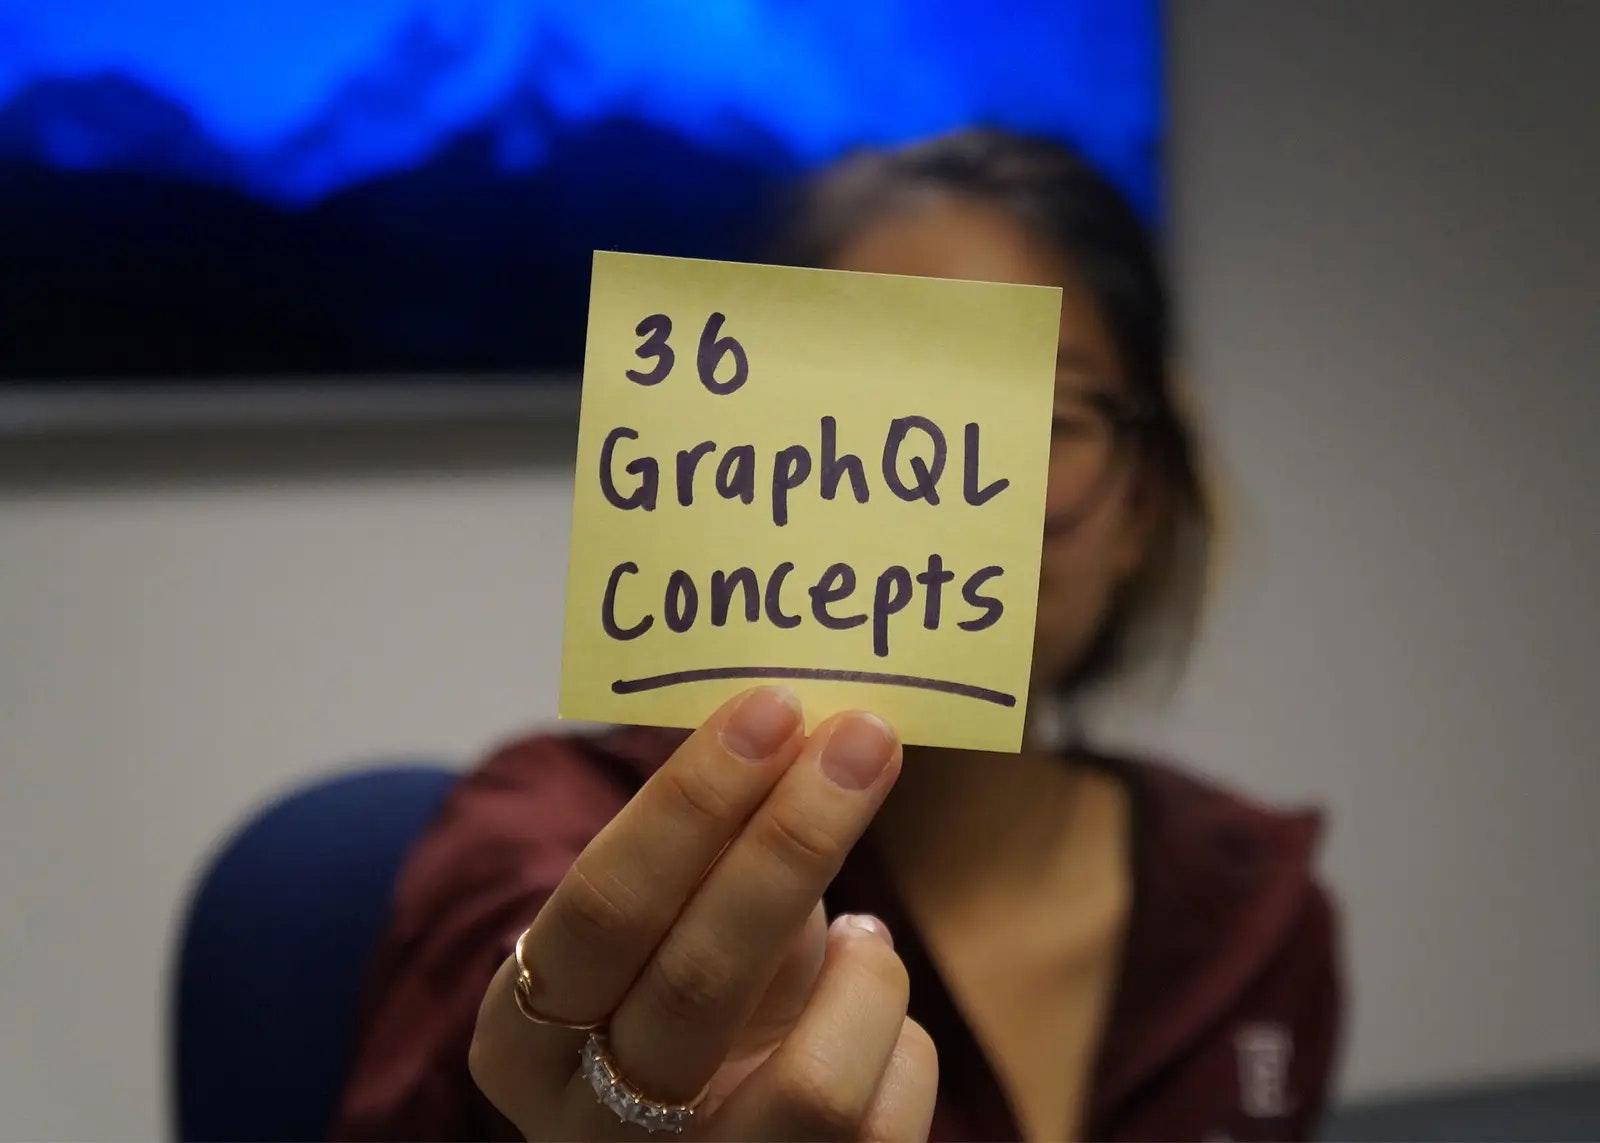 Introducing 36 GraphQL Concepts 🎉